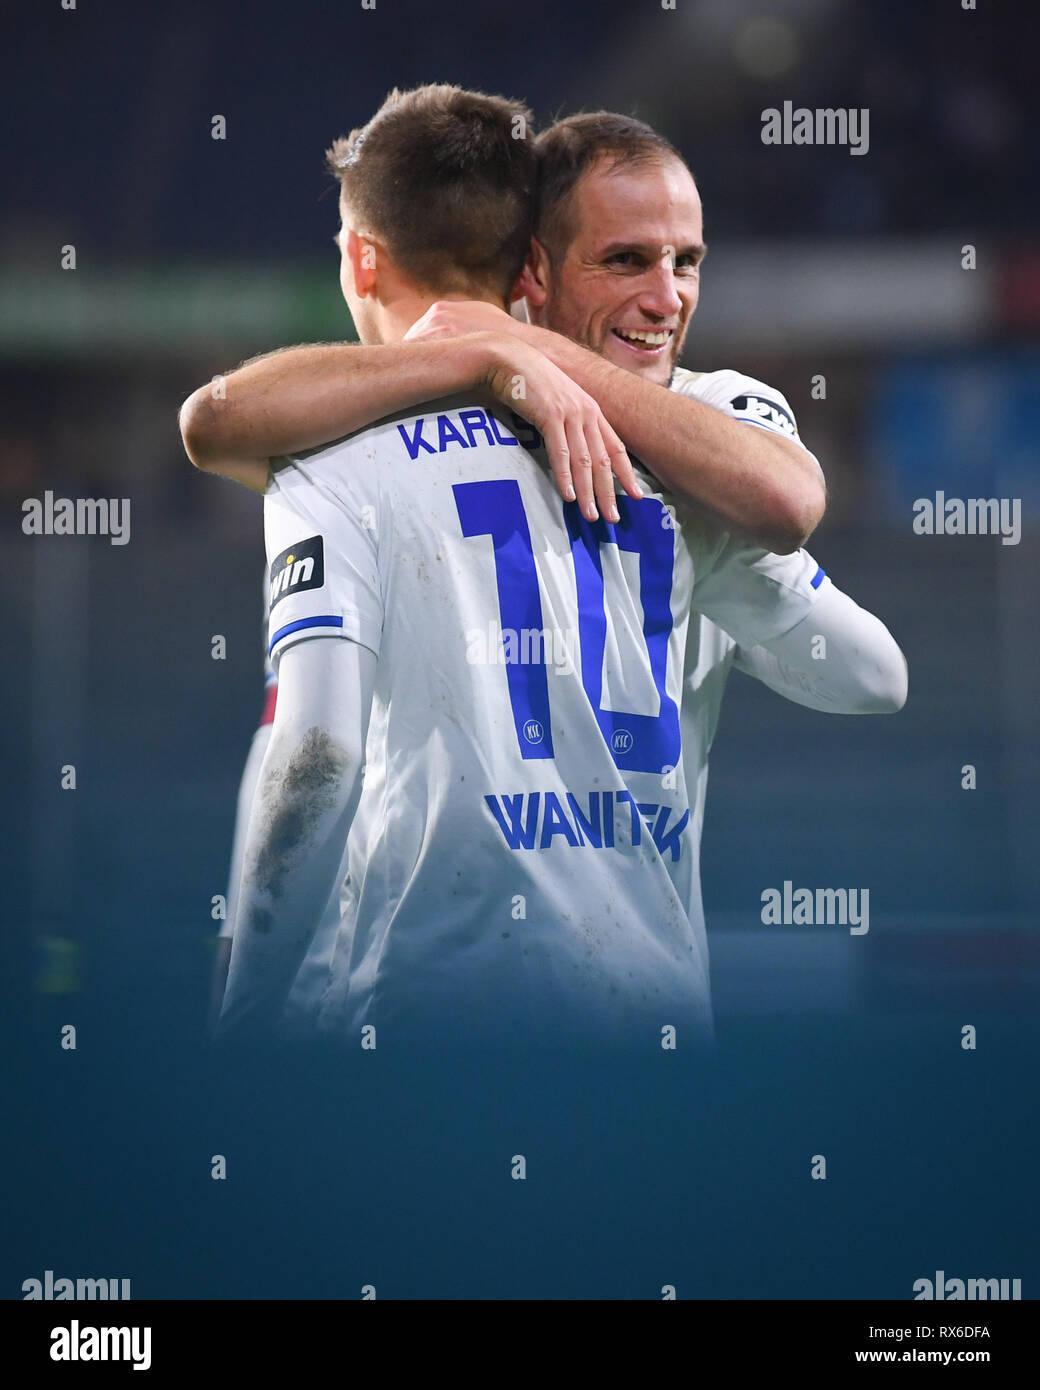 Duisburg, Deutschland. 08th Mar, 2019. final jubilation KSC: Marvin Wanitzek (KSC) hugs Manuel Stiefler (KSC). GES/football/3rd league: Krefelder football club Uerdingen - Karlsruher SC, 08.03.2019 Football/Soccer: 3rd League: KFC Uerdingen vs Karlsruher SC, Duisburg, March 8, 2019 | usage worldwide Credit: dpa/Alamy Live News - Stock Image